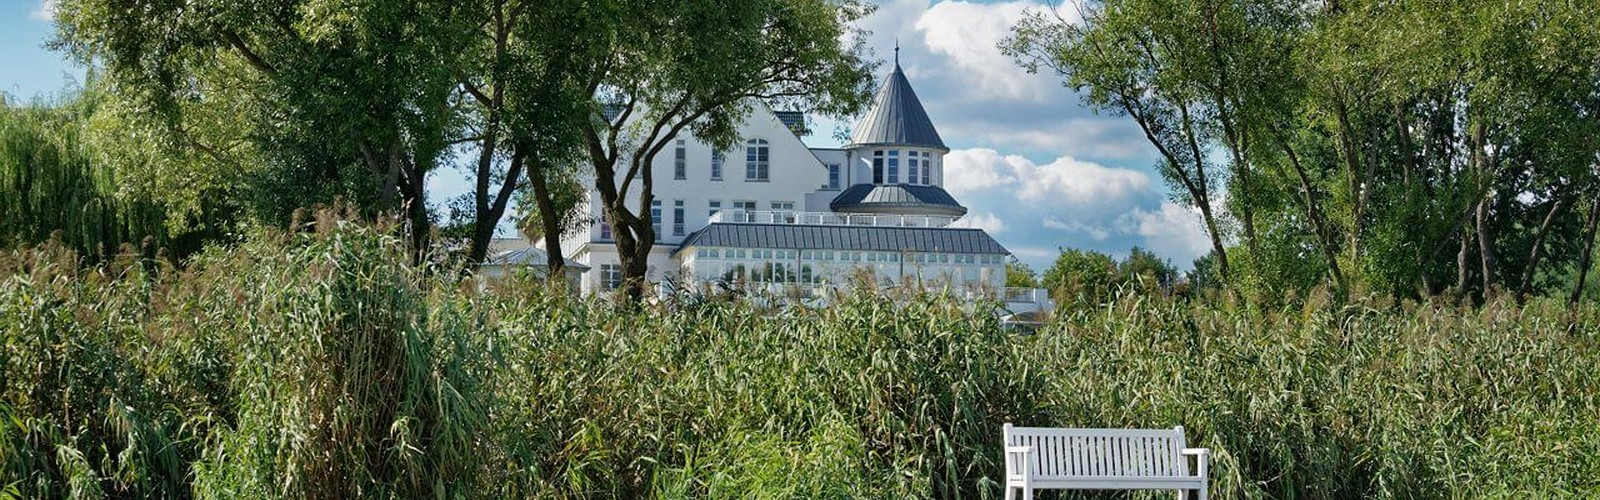 Foto: Precise Resort Schwielowsee